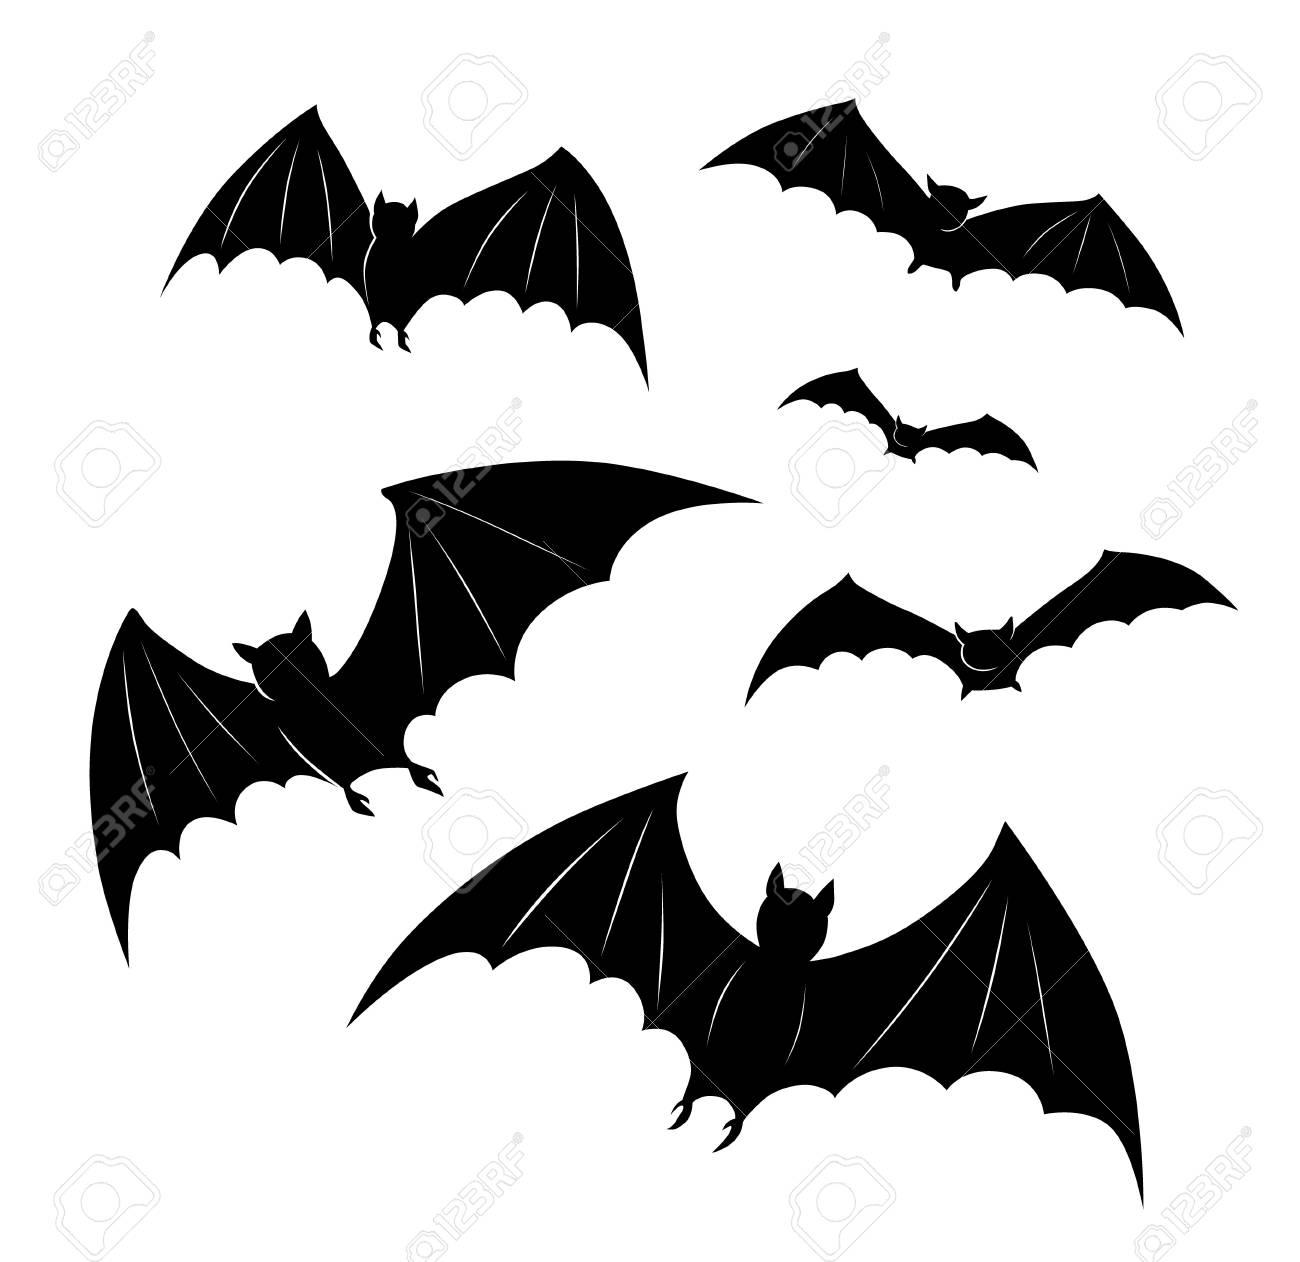 A Picture Of A Cartoon Bat halloween cartoon bats flying. all saints' eve black vector illustration..